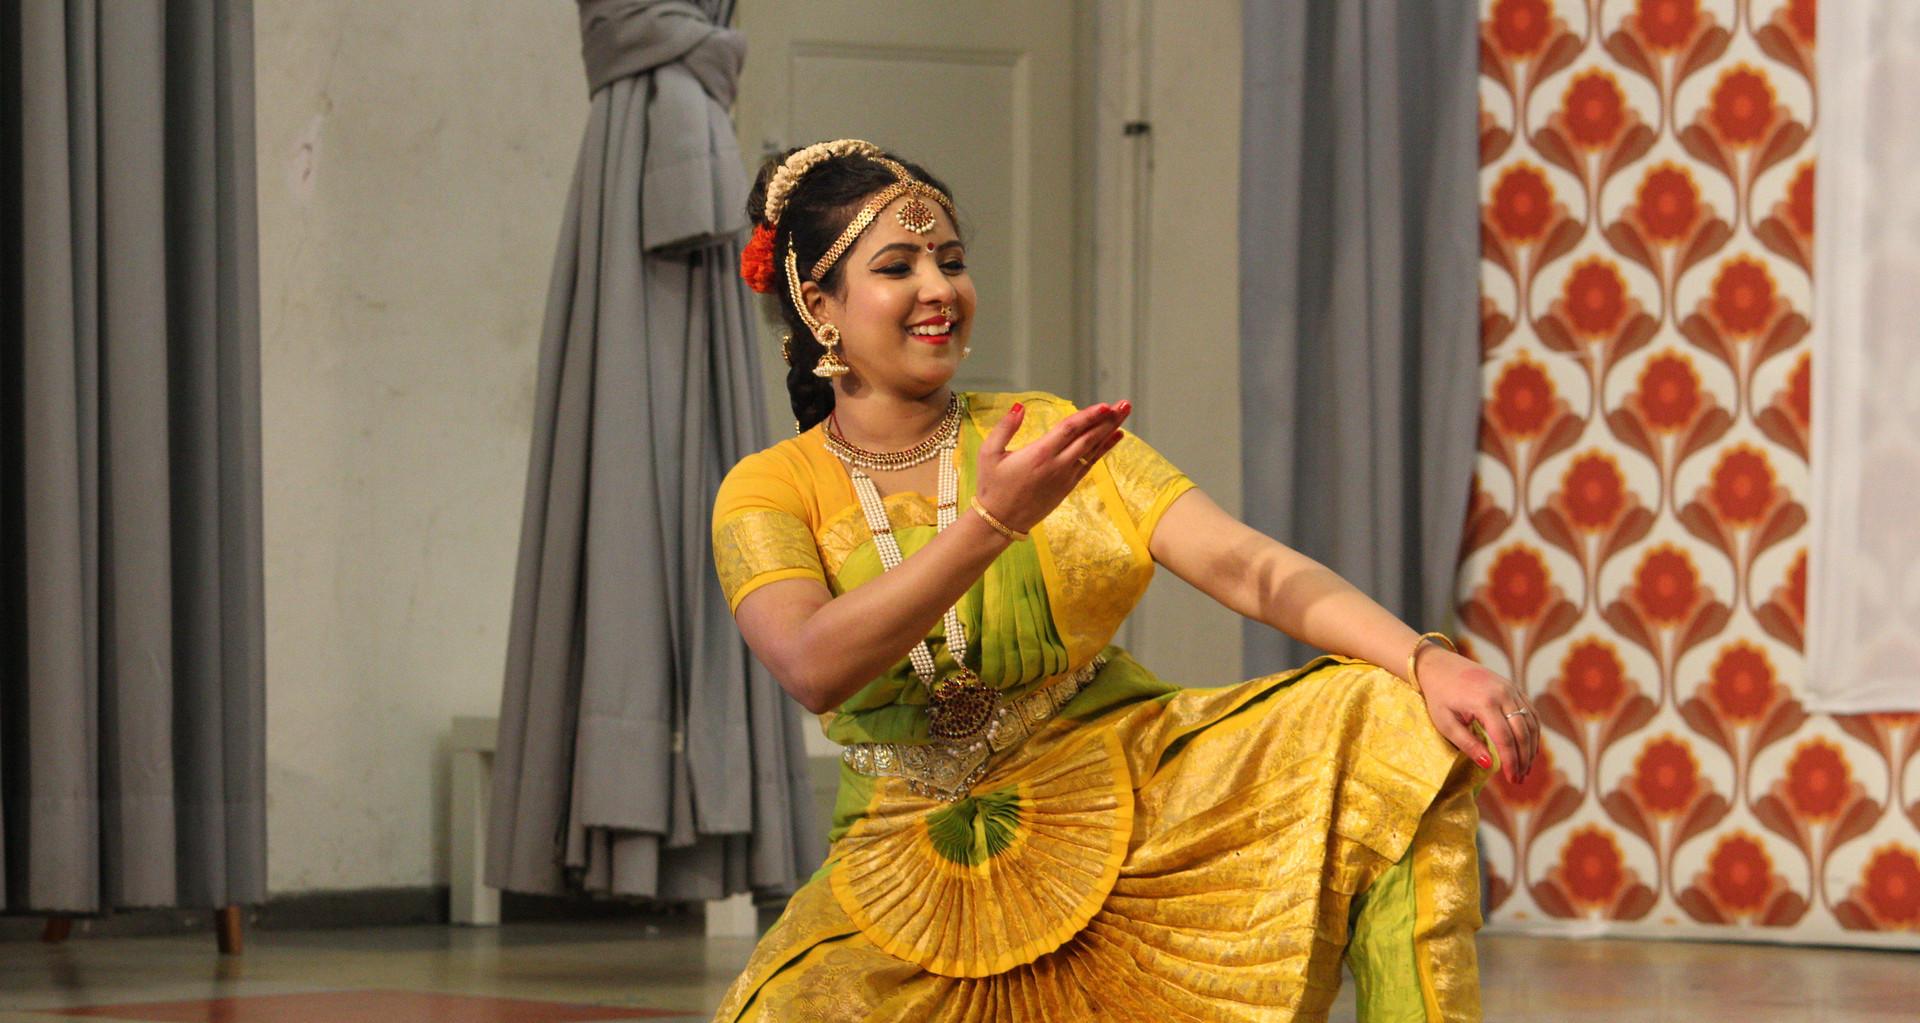 Vaishu Vaidynathan